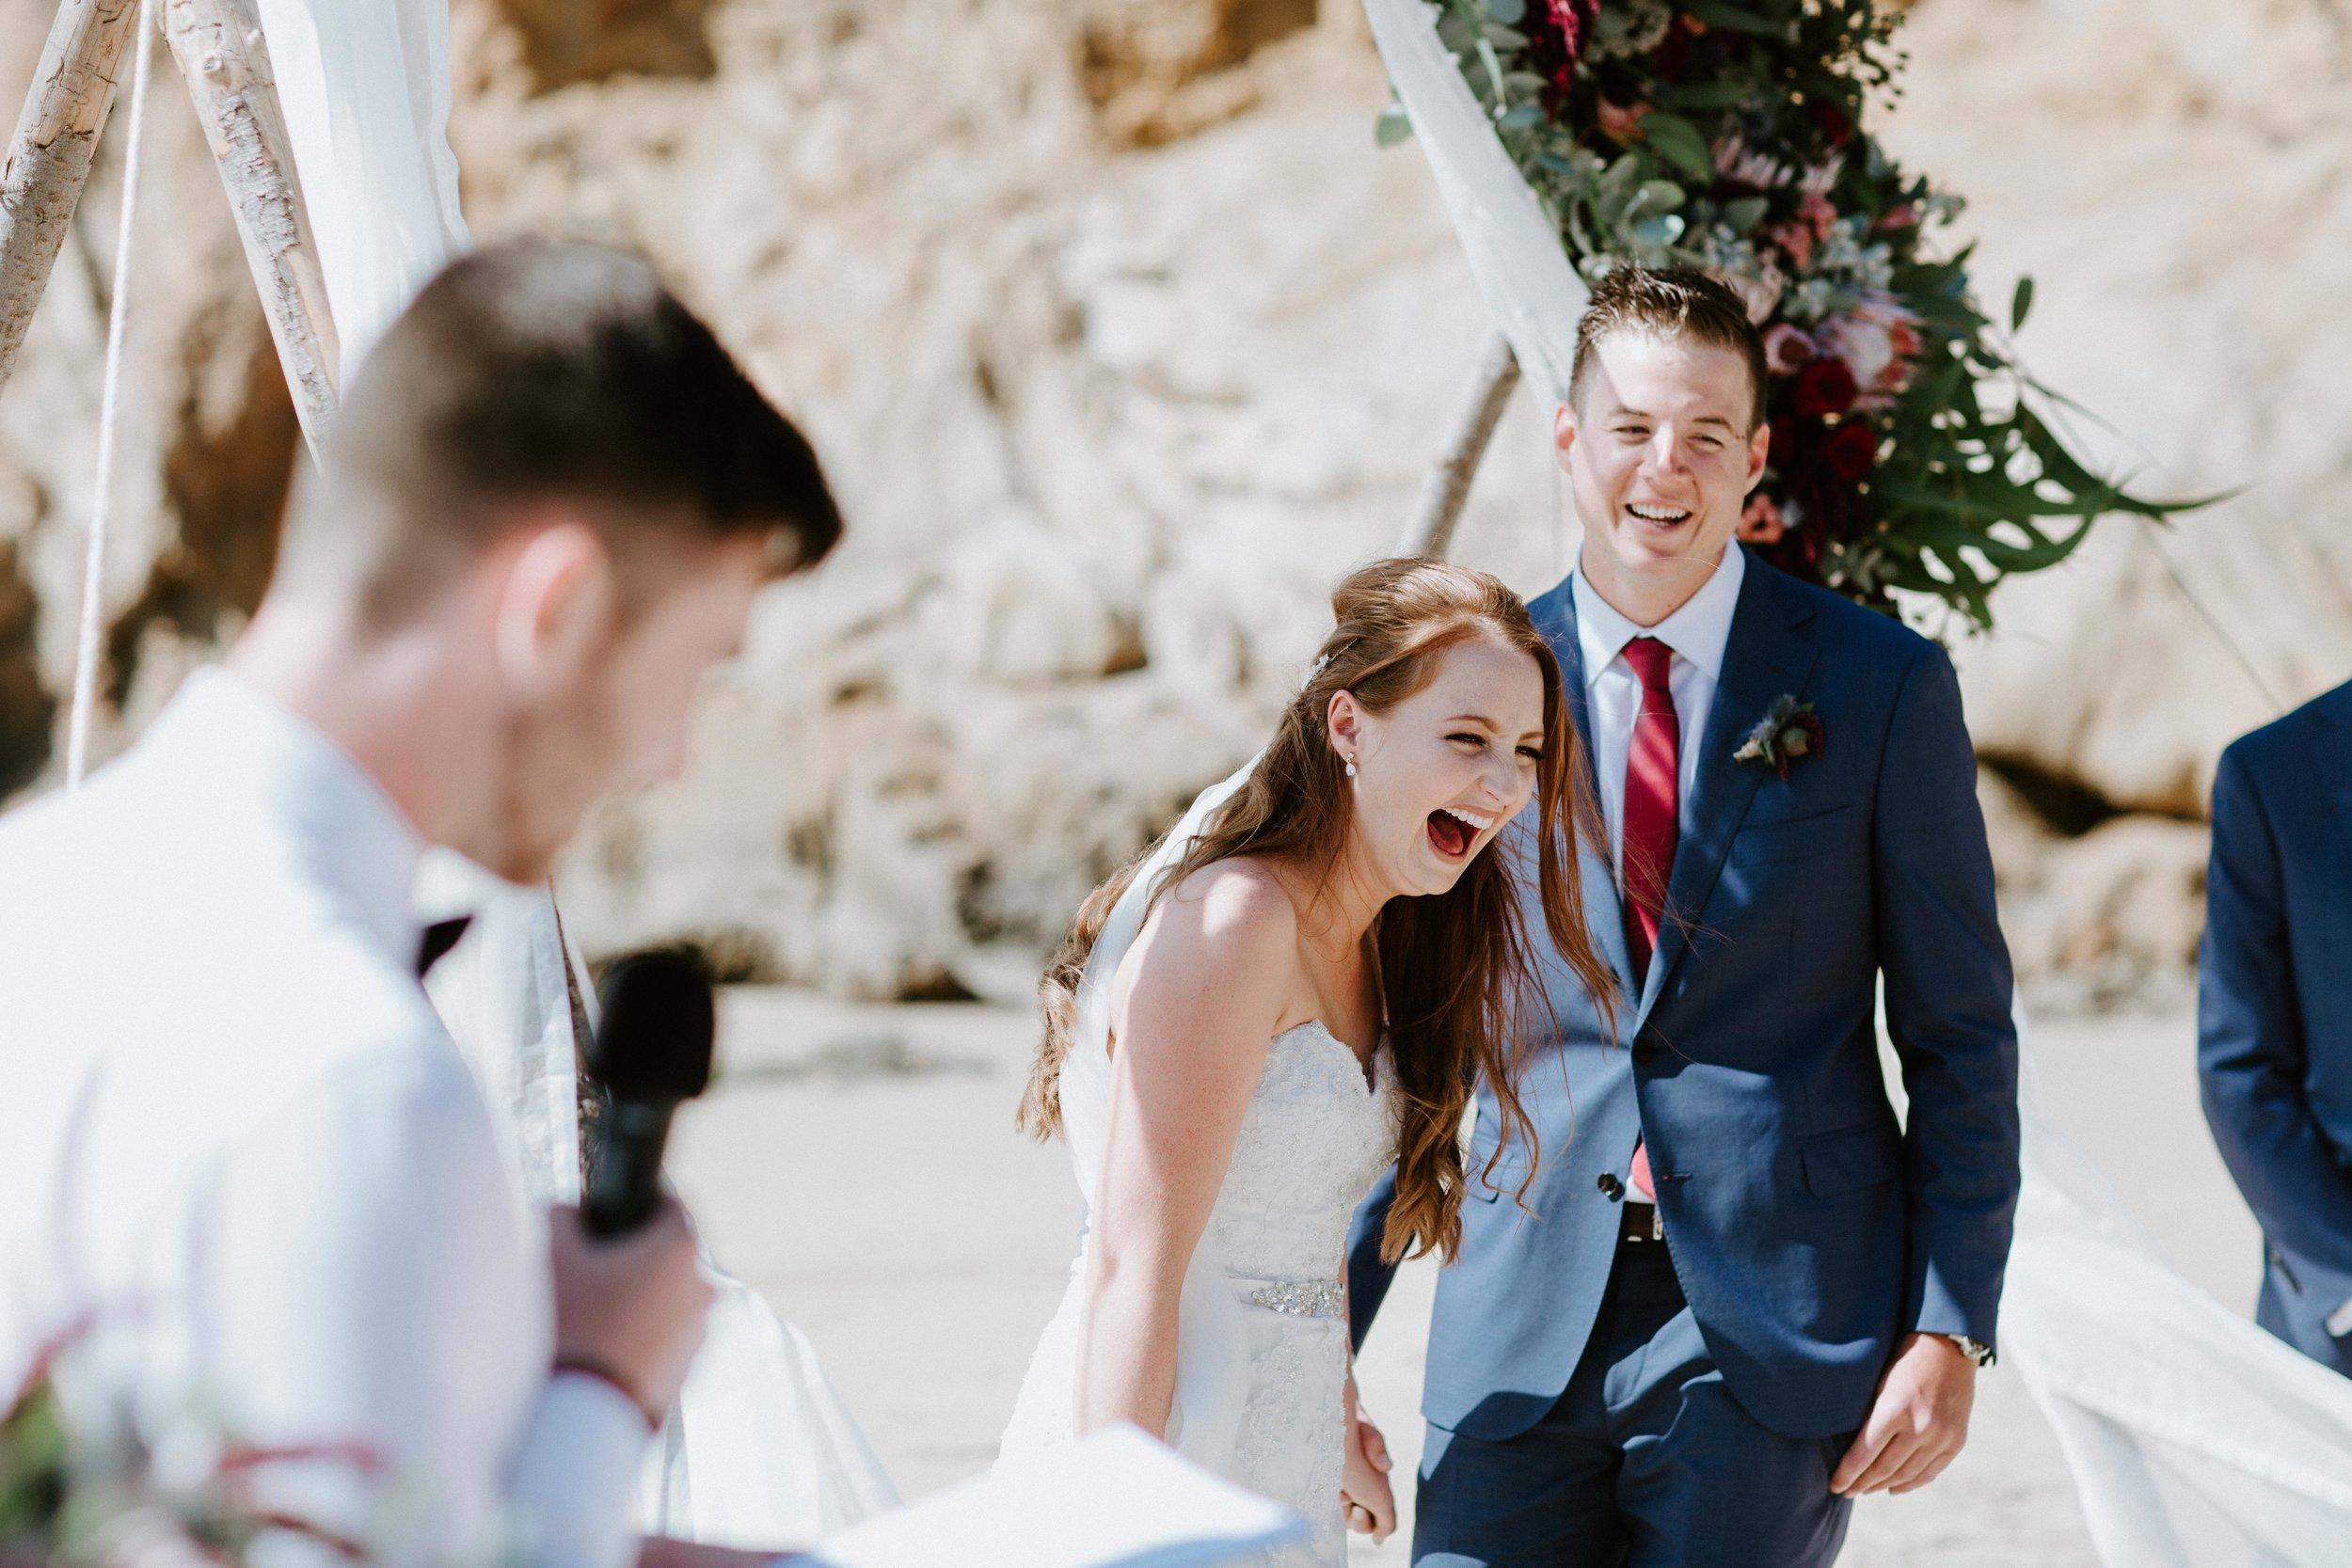 Tara + Luke Wedding - Finals-357.jpg